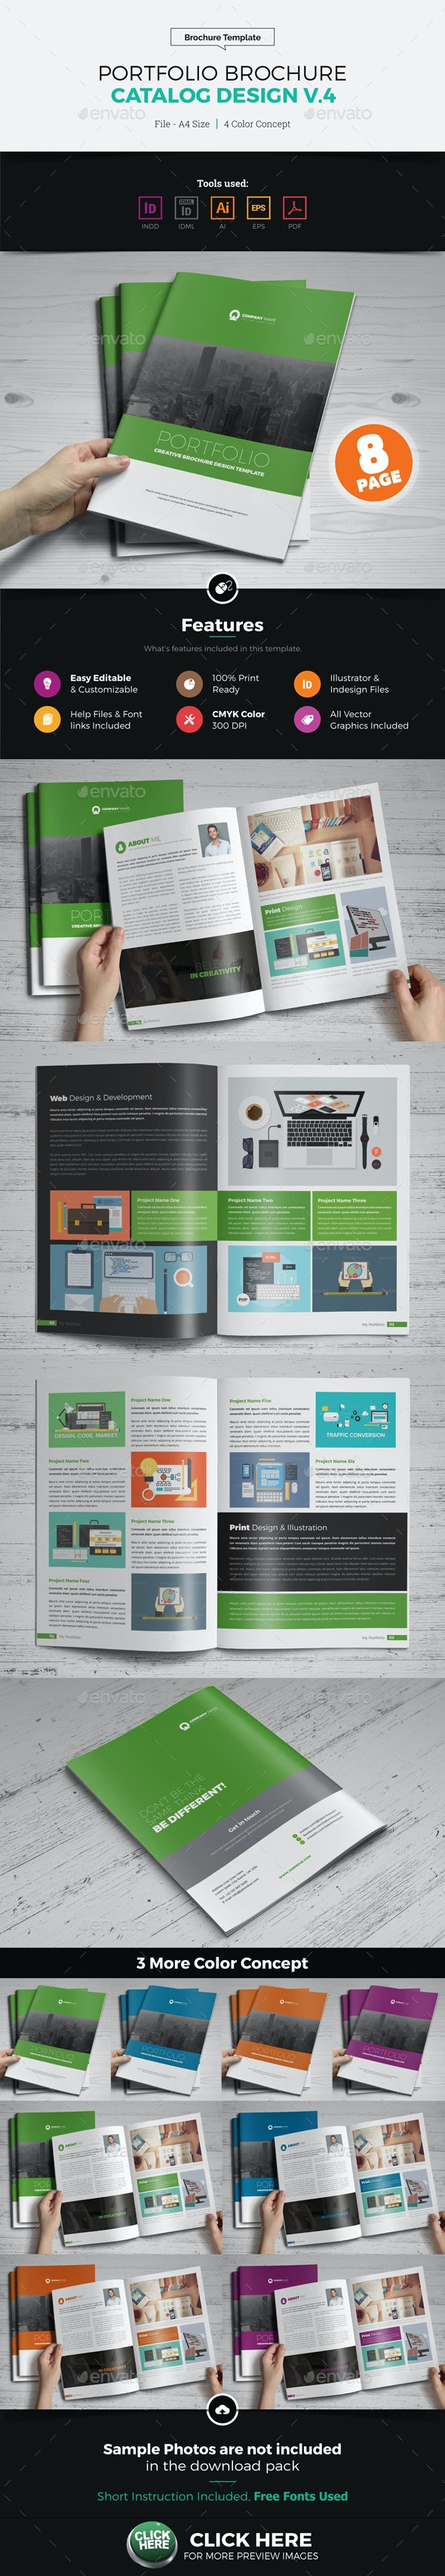 Portfolio Brochure Catalog Design v4 - Corporate Brochures